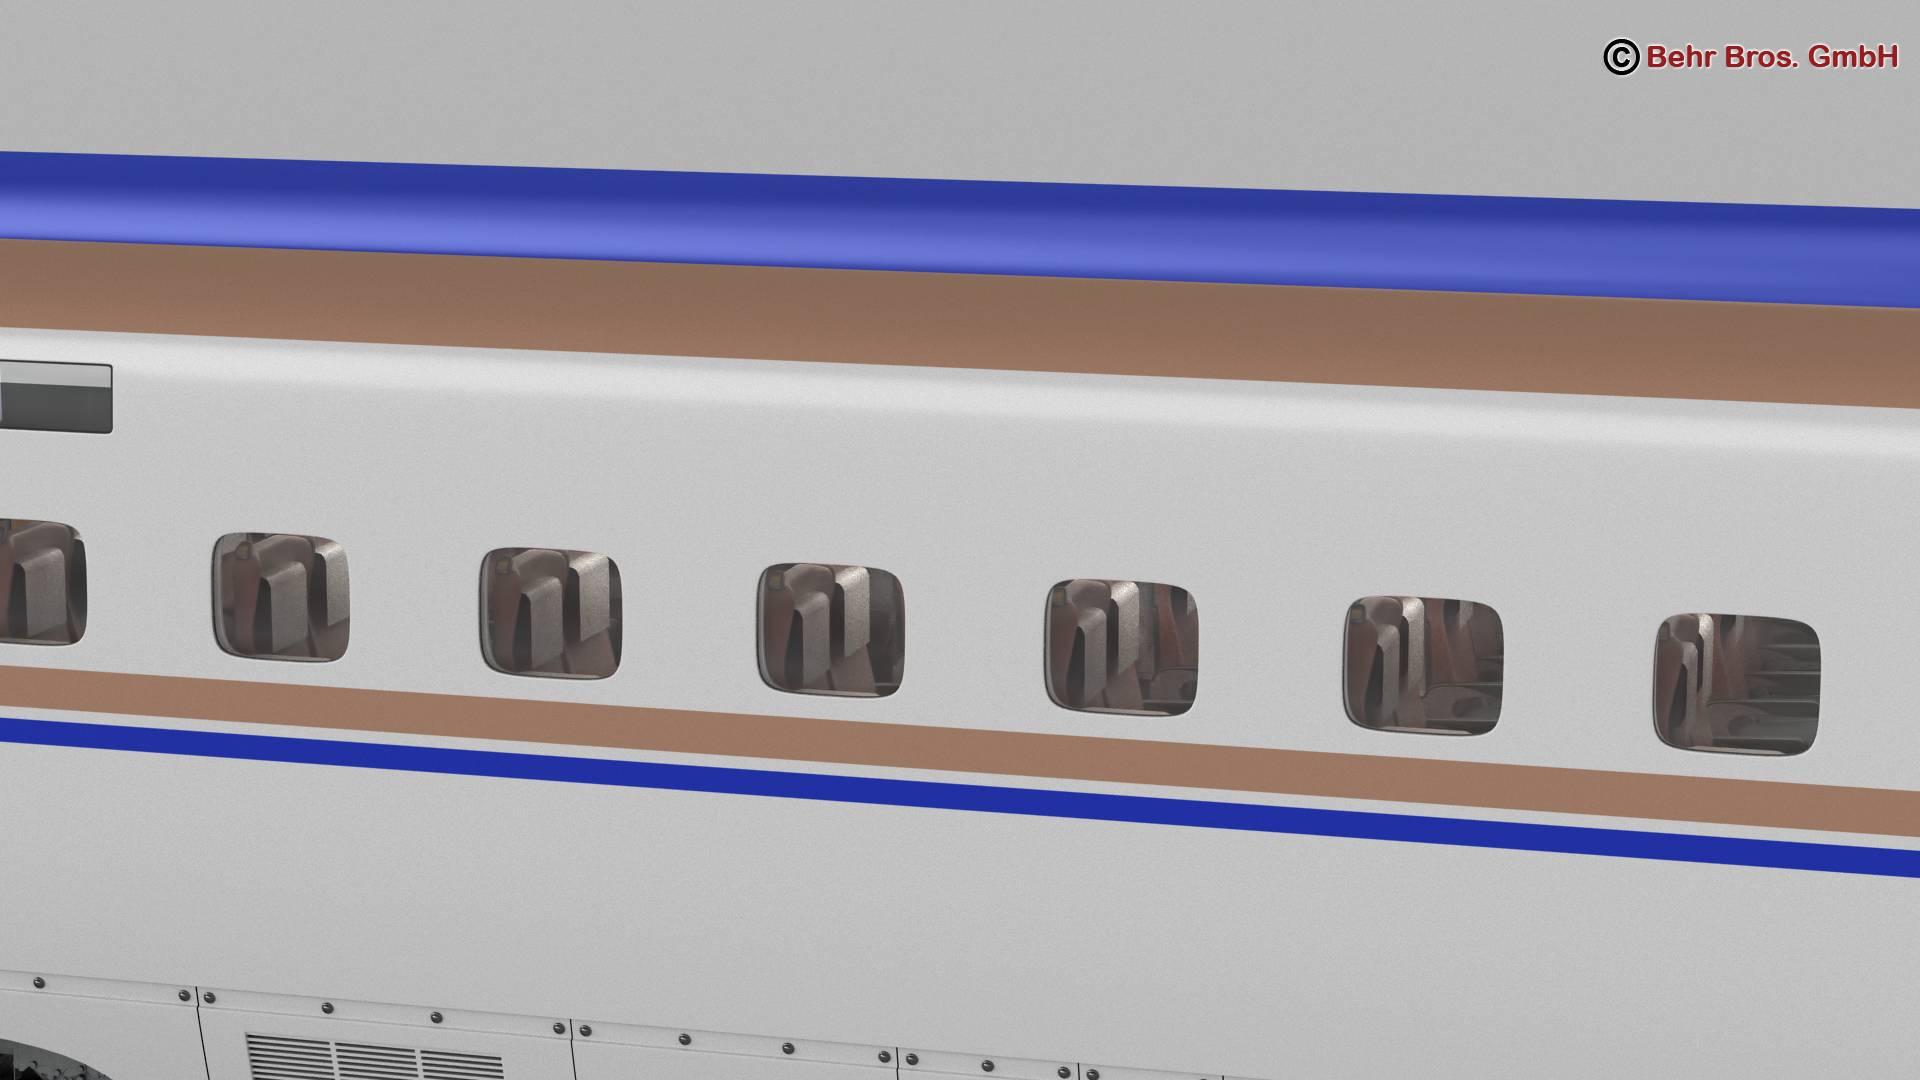 shinkansen e7 3d model 3ds max fbx c4d lwo ma mb obj 265656